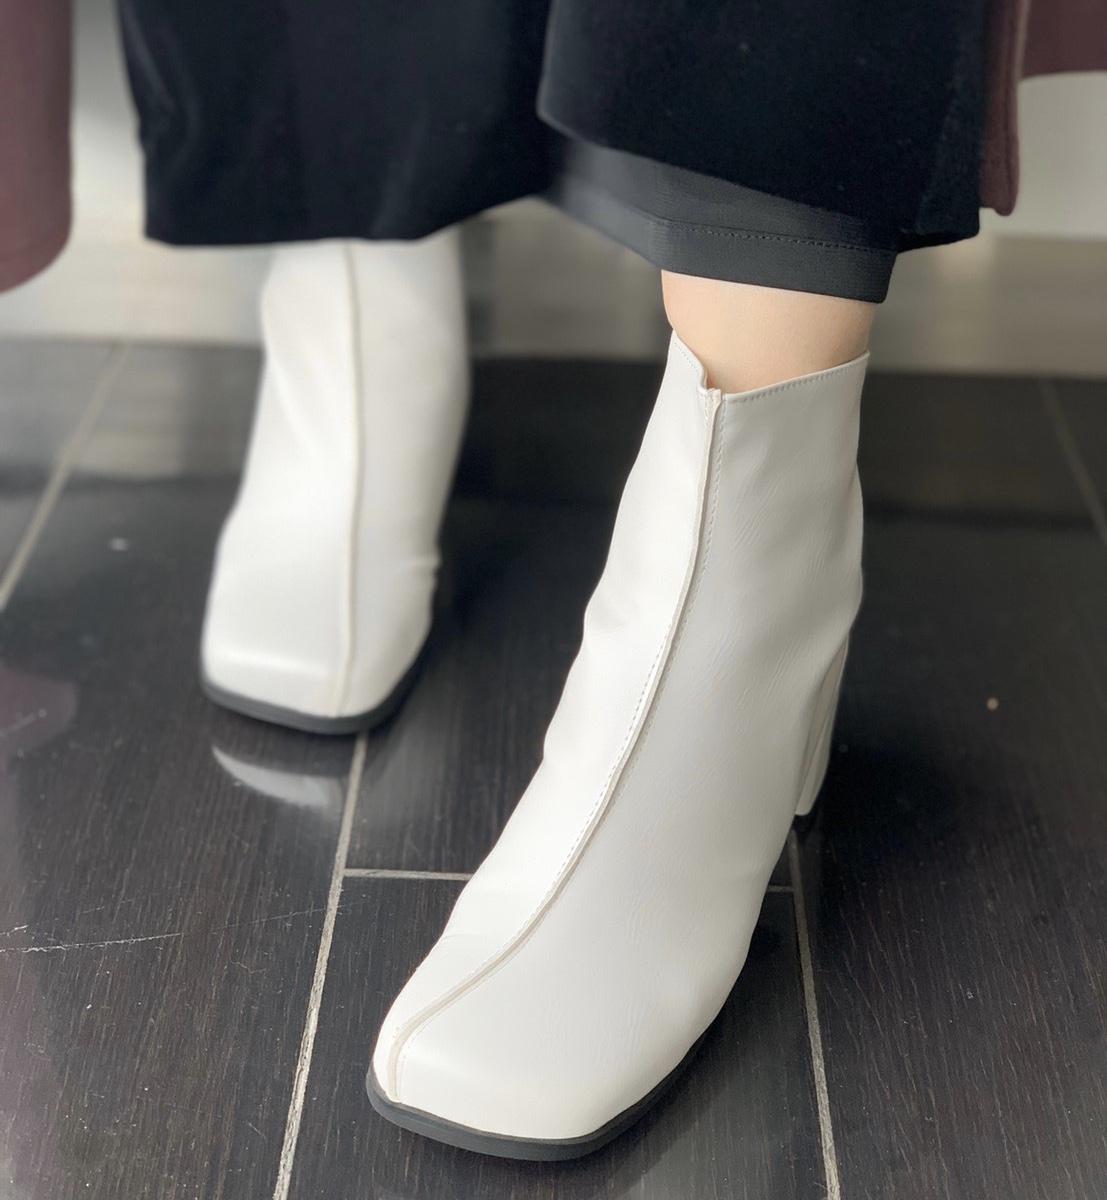 ScrapBook スクラップブック 有楽町 有楽町マルイ ブーツ boots スクエア チャンキーヒール ホワイト ブラック 合皮ブーツ 履きやすい